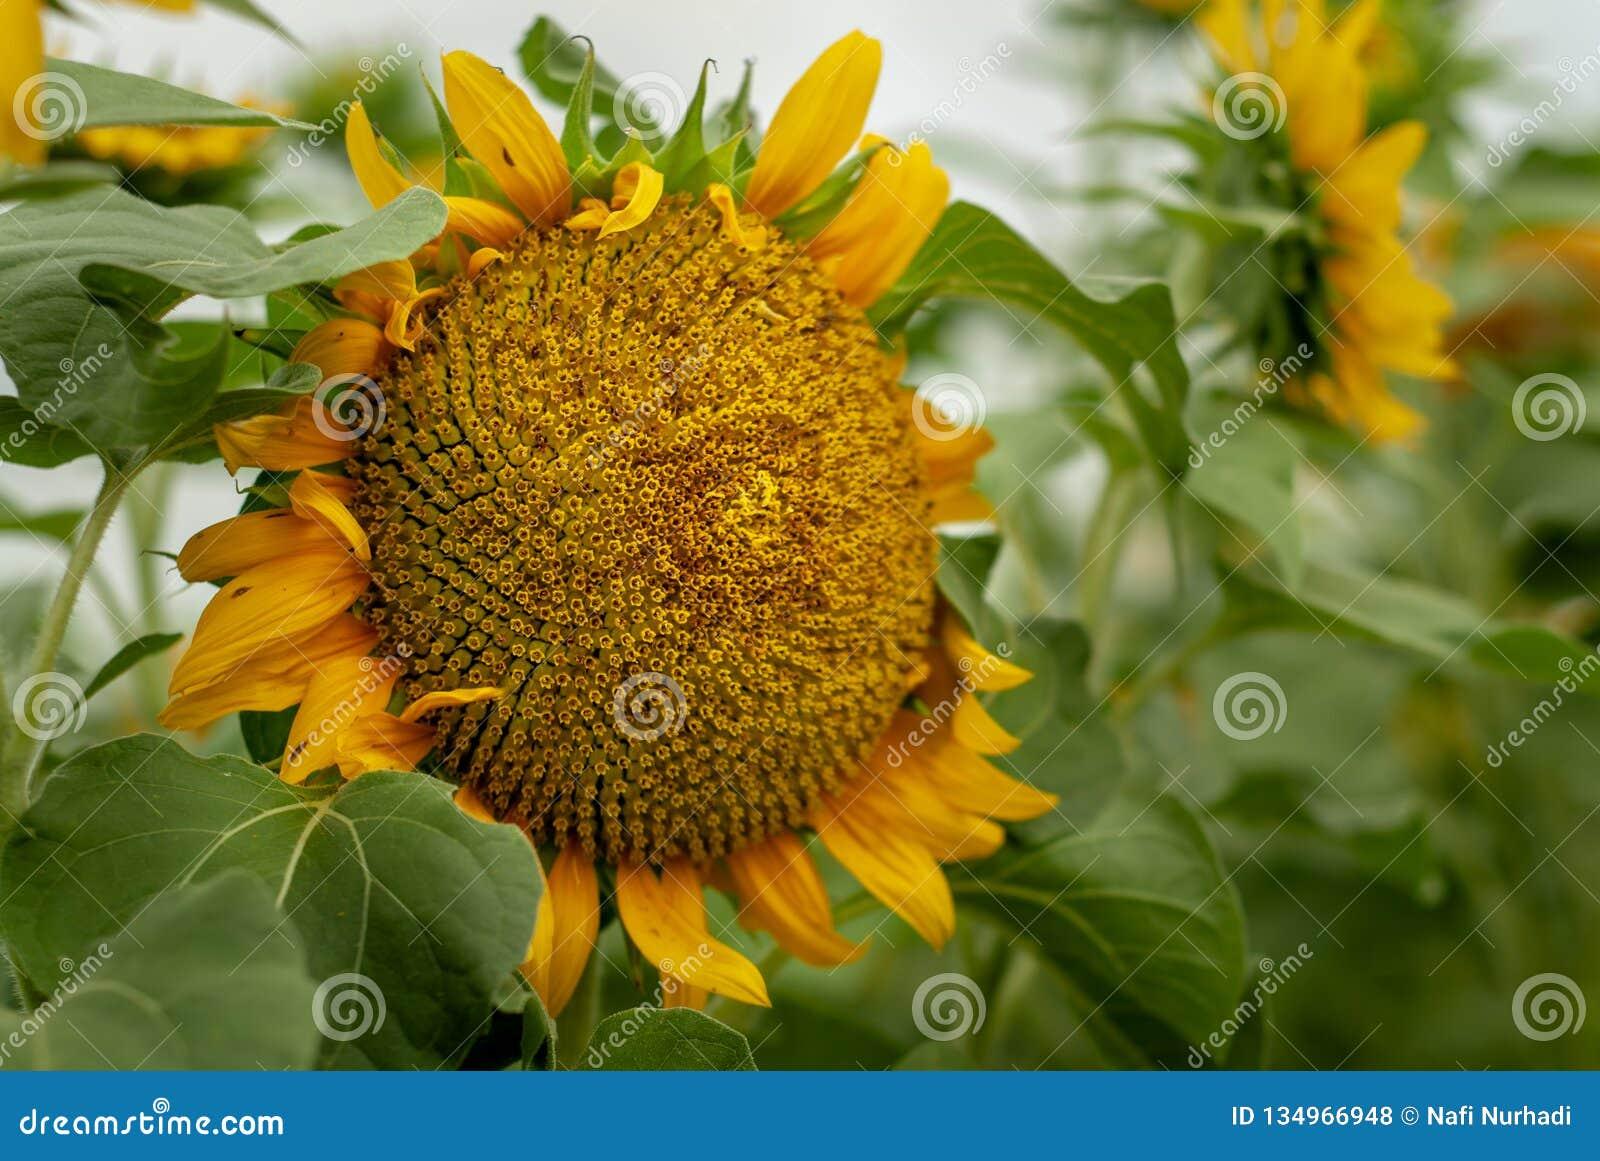 Bright yellow sunflowers in full bloom